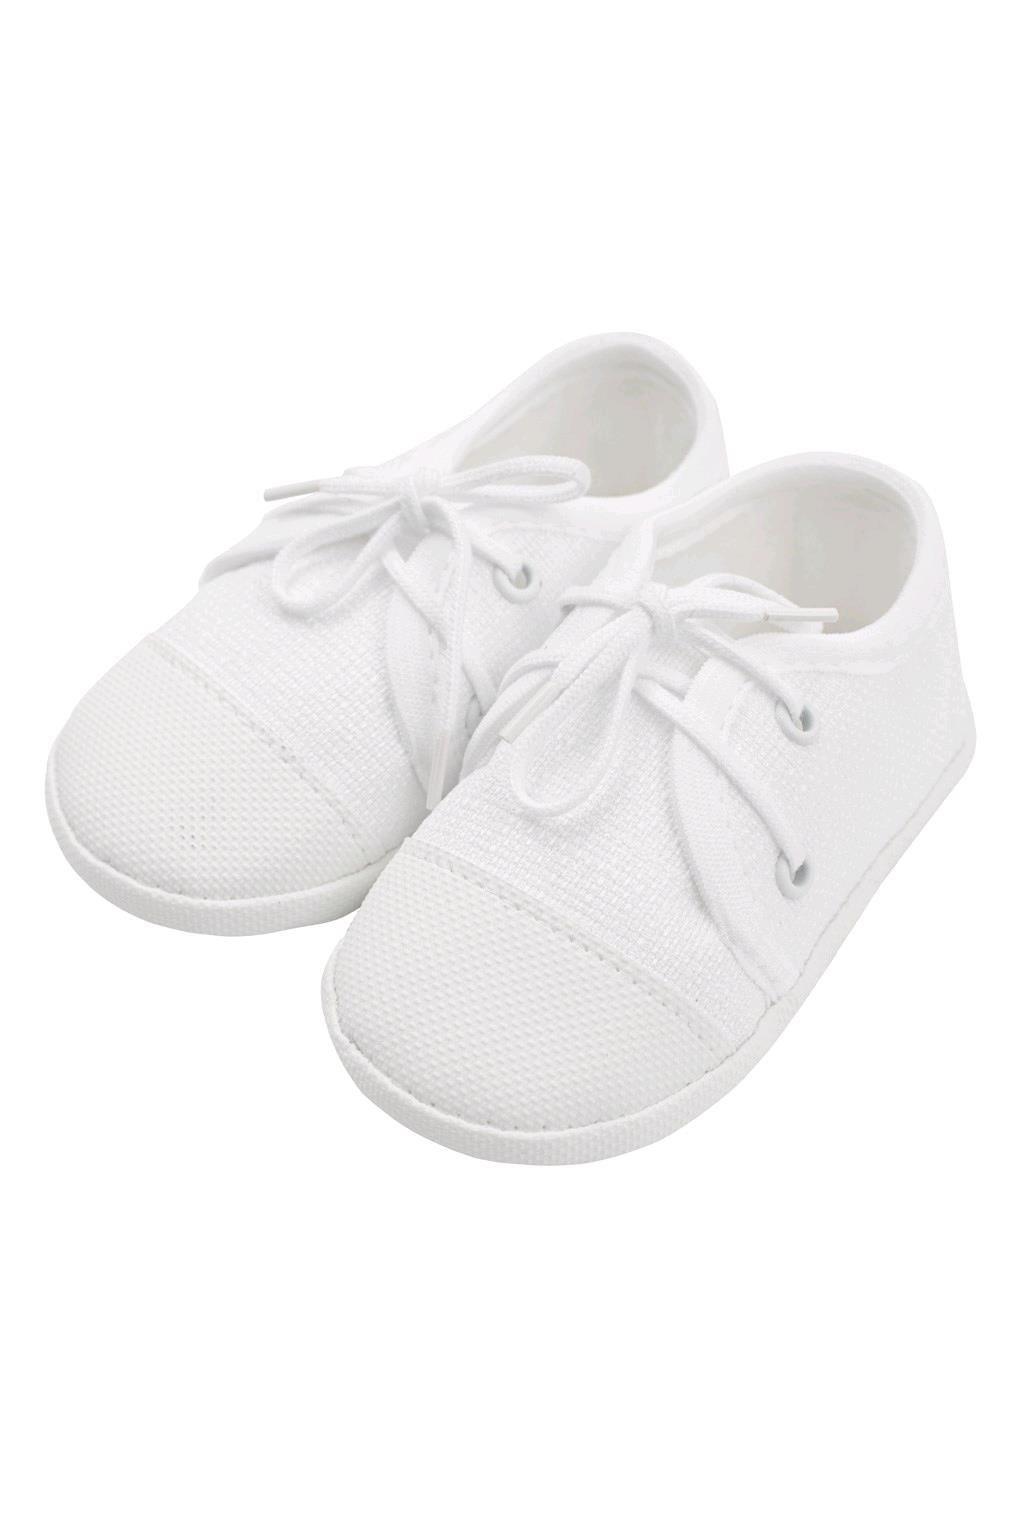 Dojčenské capačky tenisky New Baby biele 3-6 m